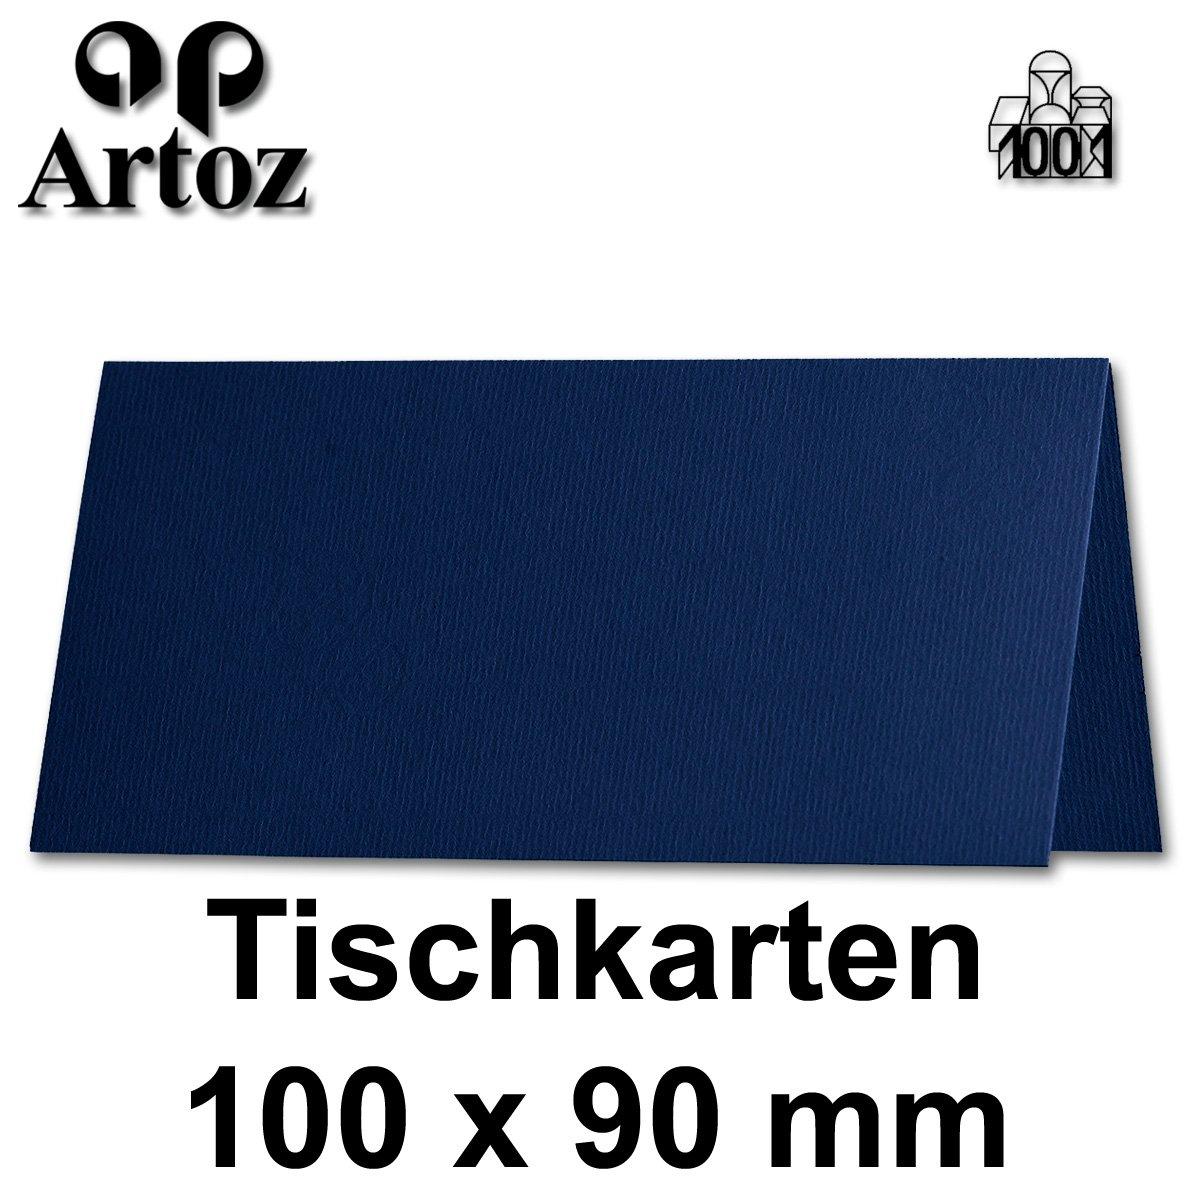 50x original ARTOZ Tischkarten//SERIE 1001//100 x 90 mm//Chamois//+alle Farben NEUSER